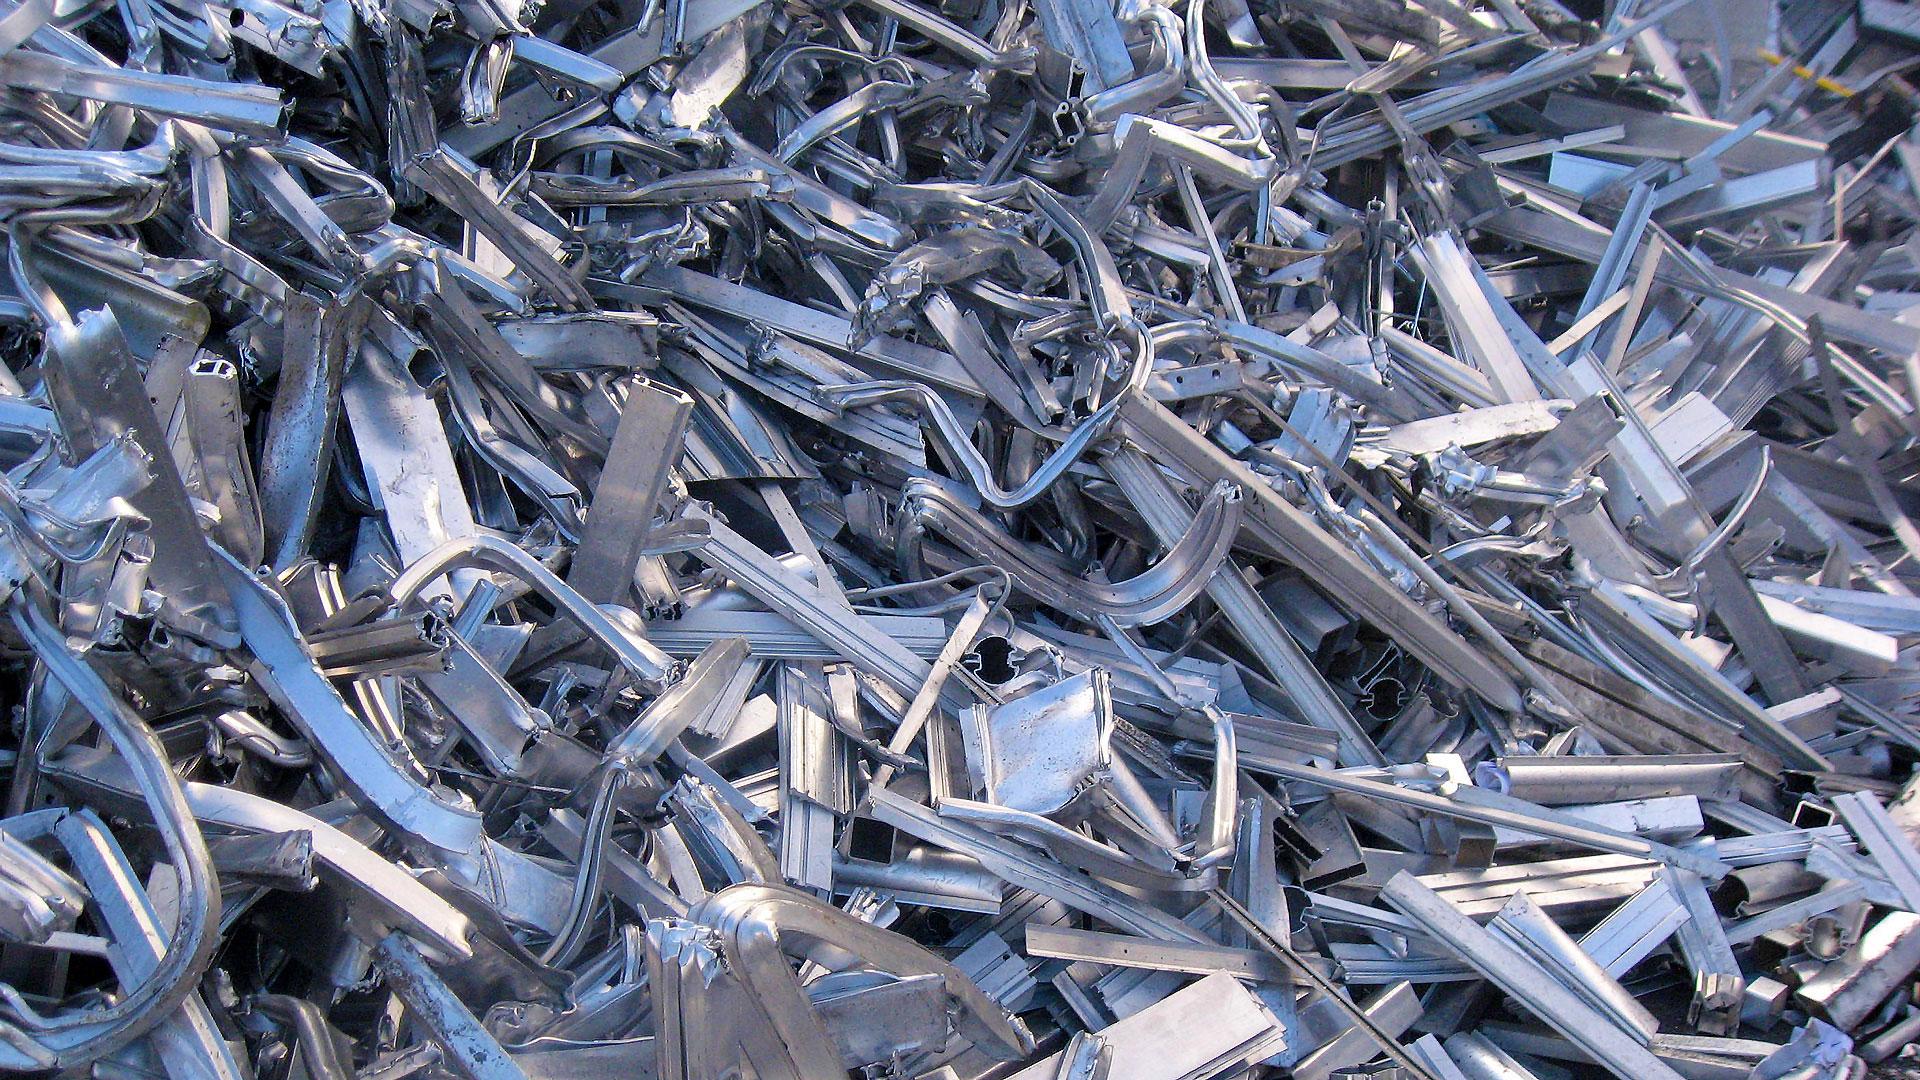 http://www.terminerecuperi.it/wp-content/uploads/2017/03/rottame-alluminio.jpg